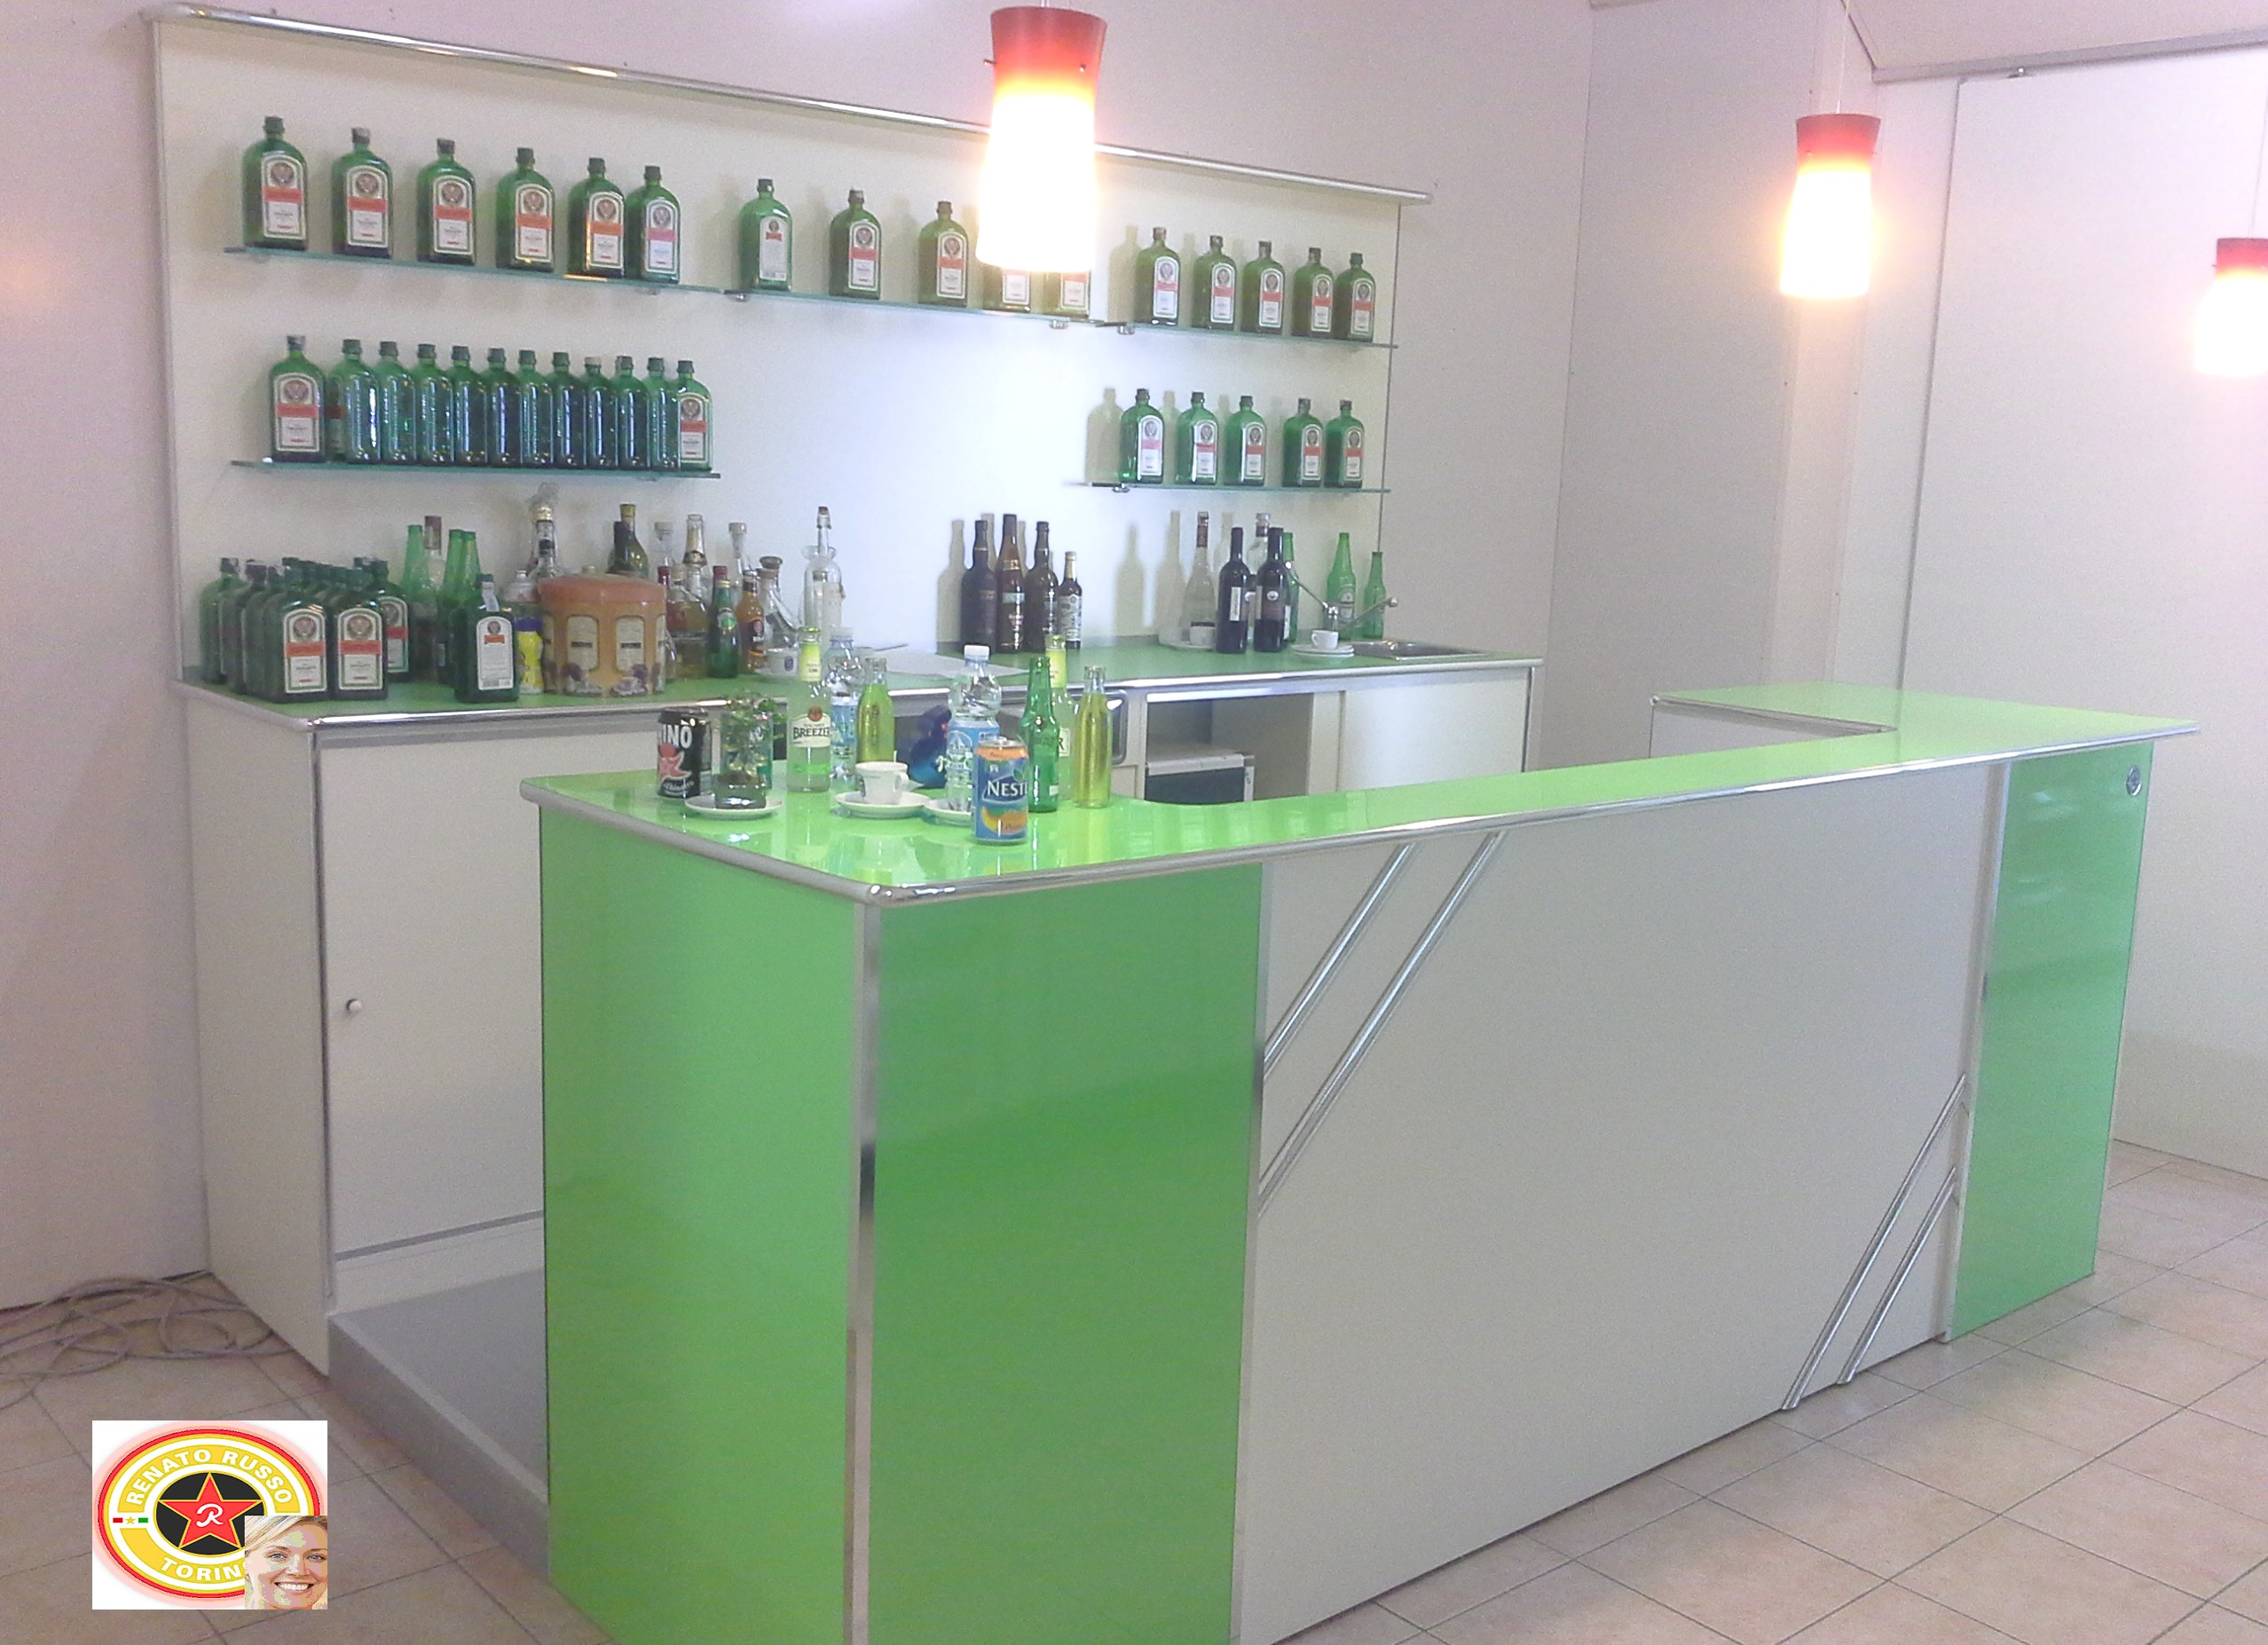 Vetrine refrigerate compra in fabbrica vetrine per for Arredamenti bar prezzi